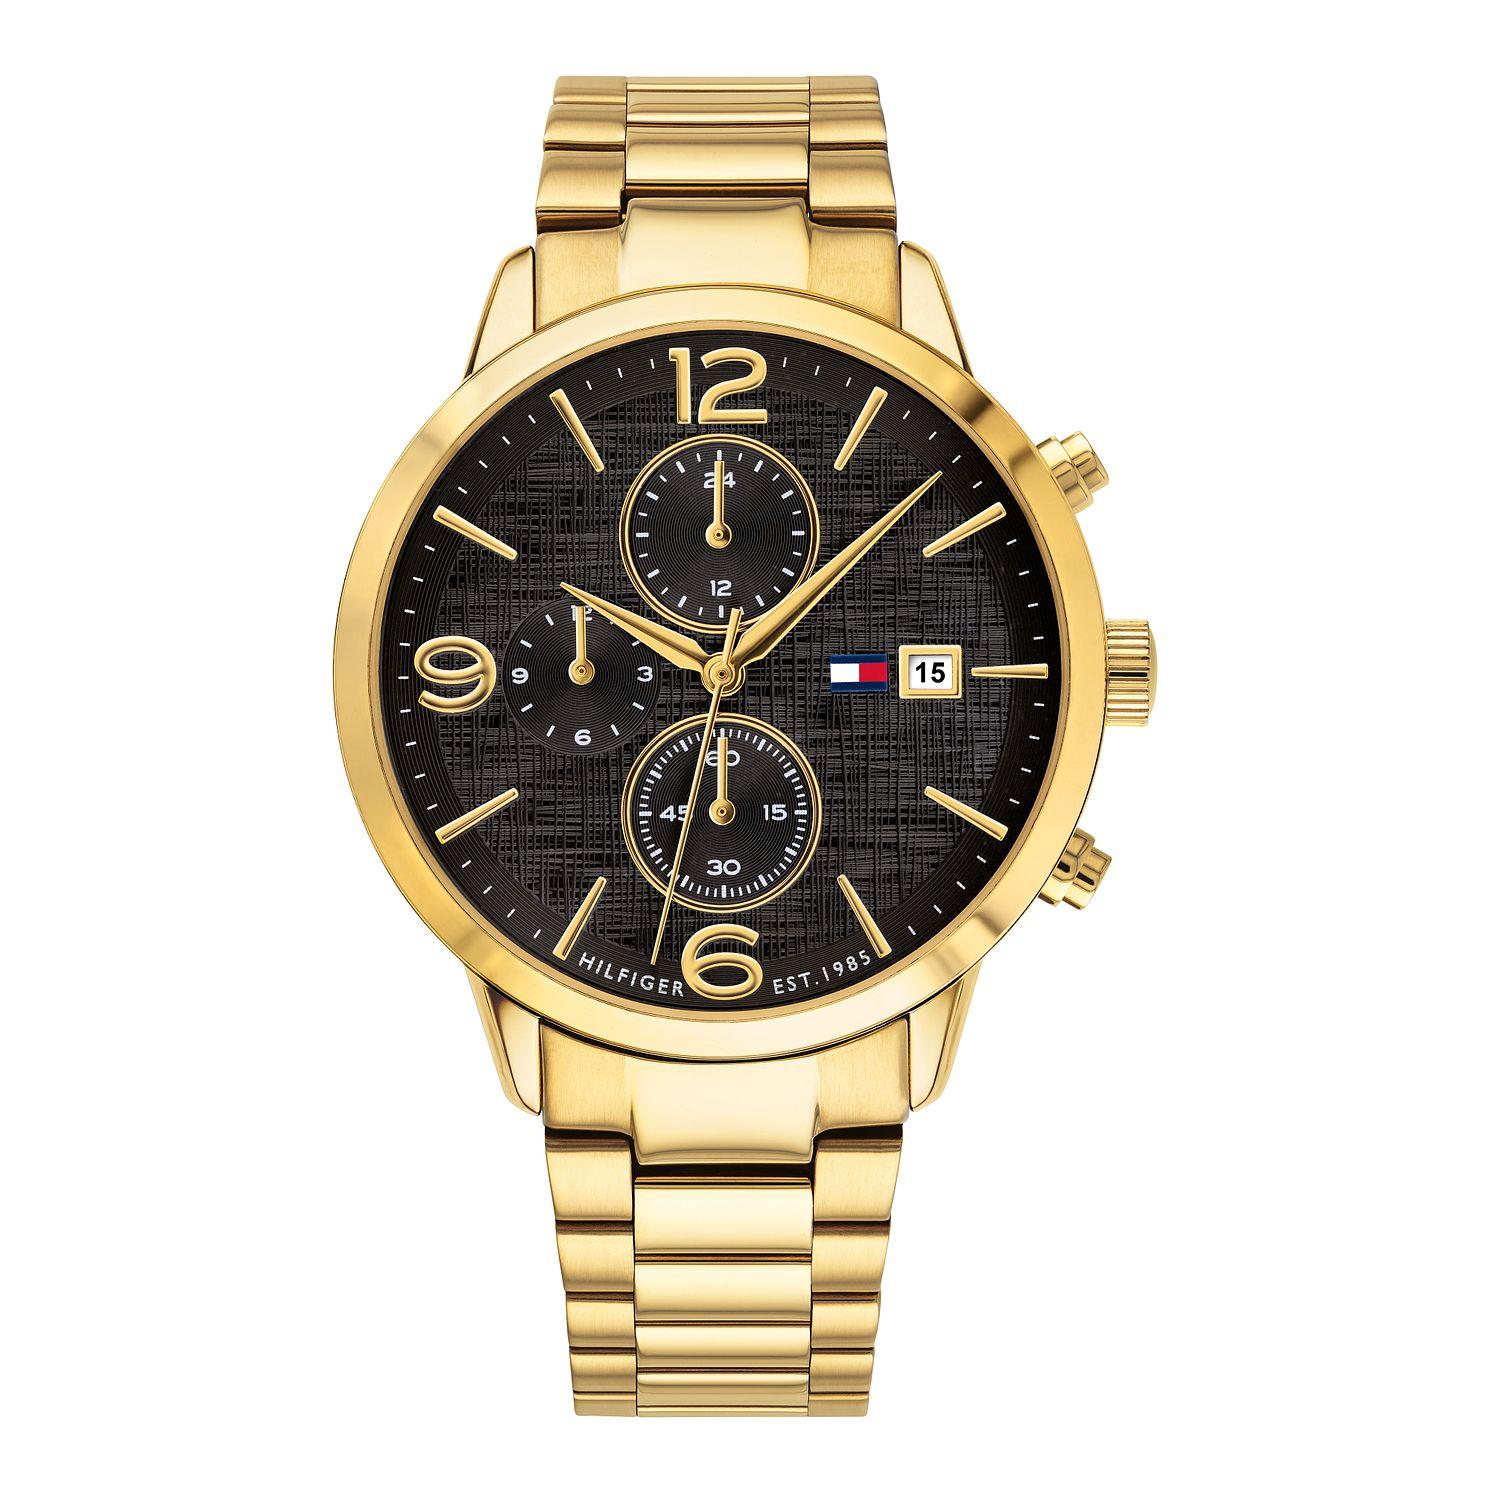 Tommy Hilfiger 1710362 Men's Gold Tone Black Dial Chronograph Watch £89.99 Delivered @ H Samuel